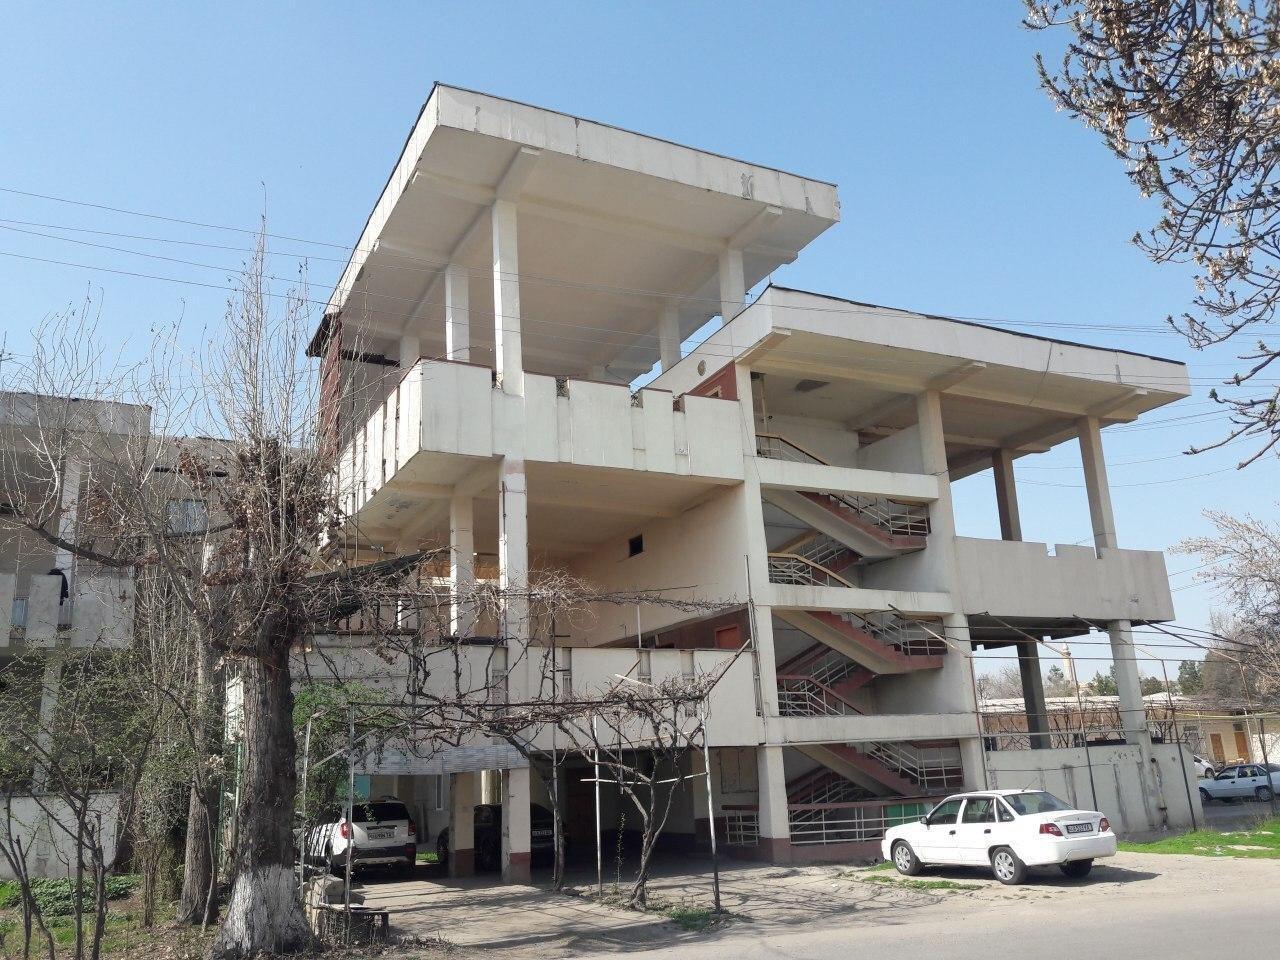 Каноны архитектуры или нужна ли нам своя архитектурная школа?